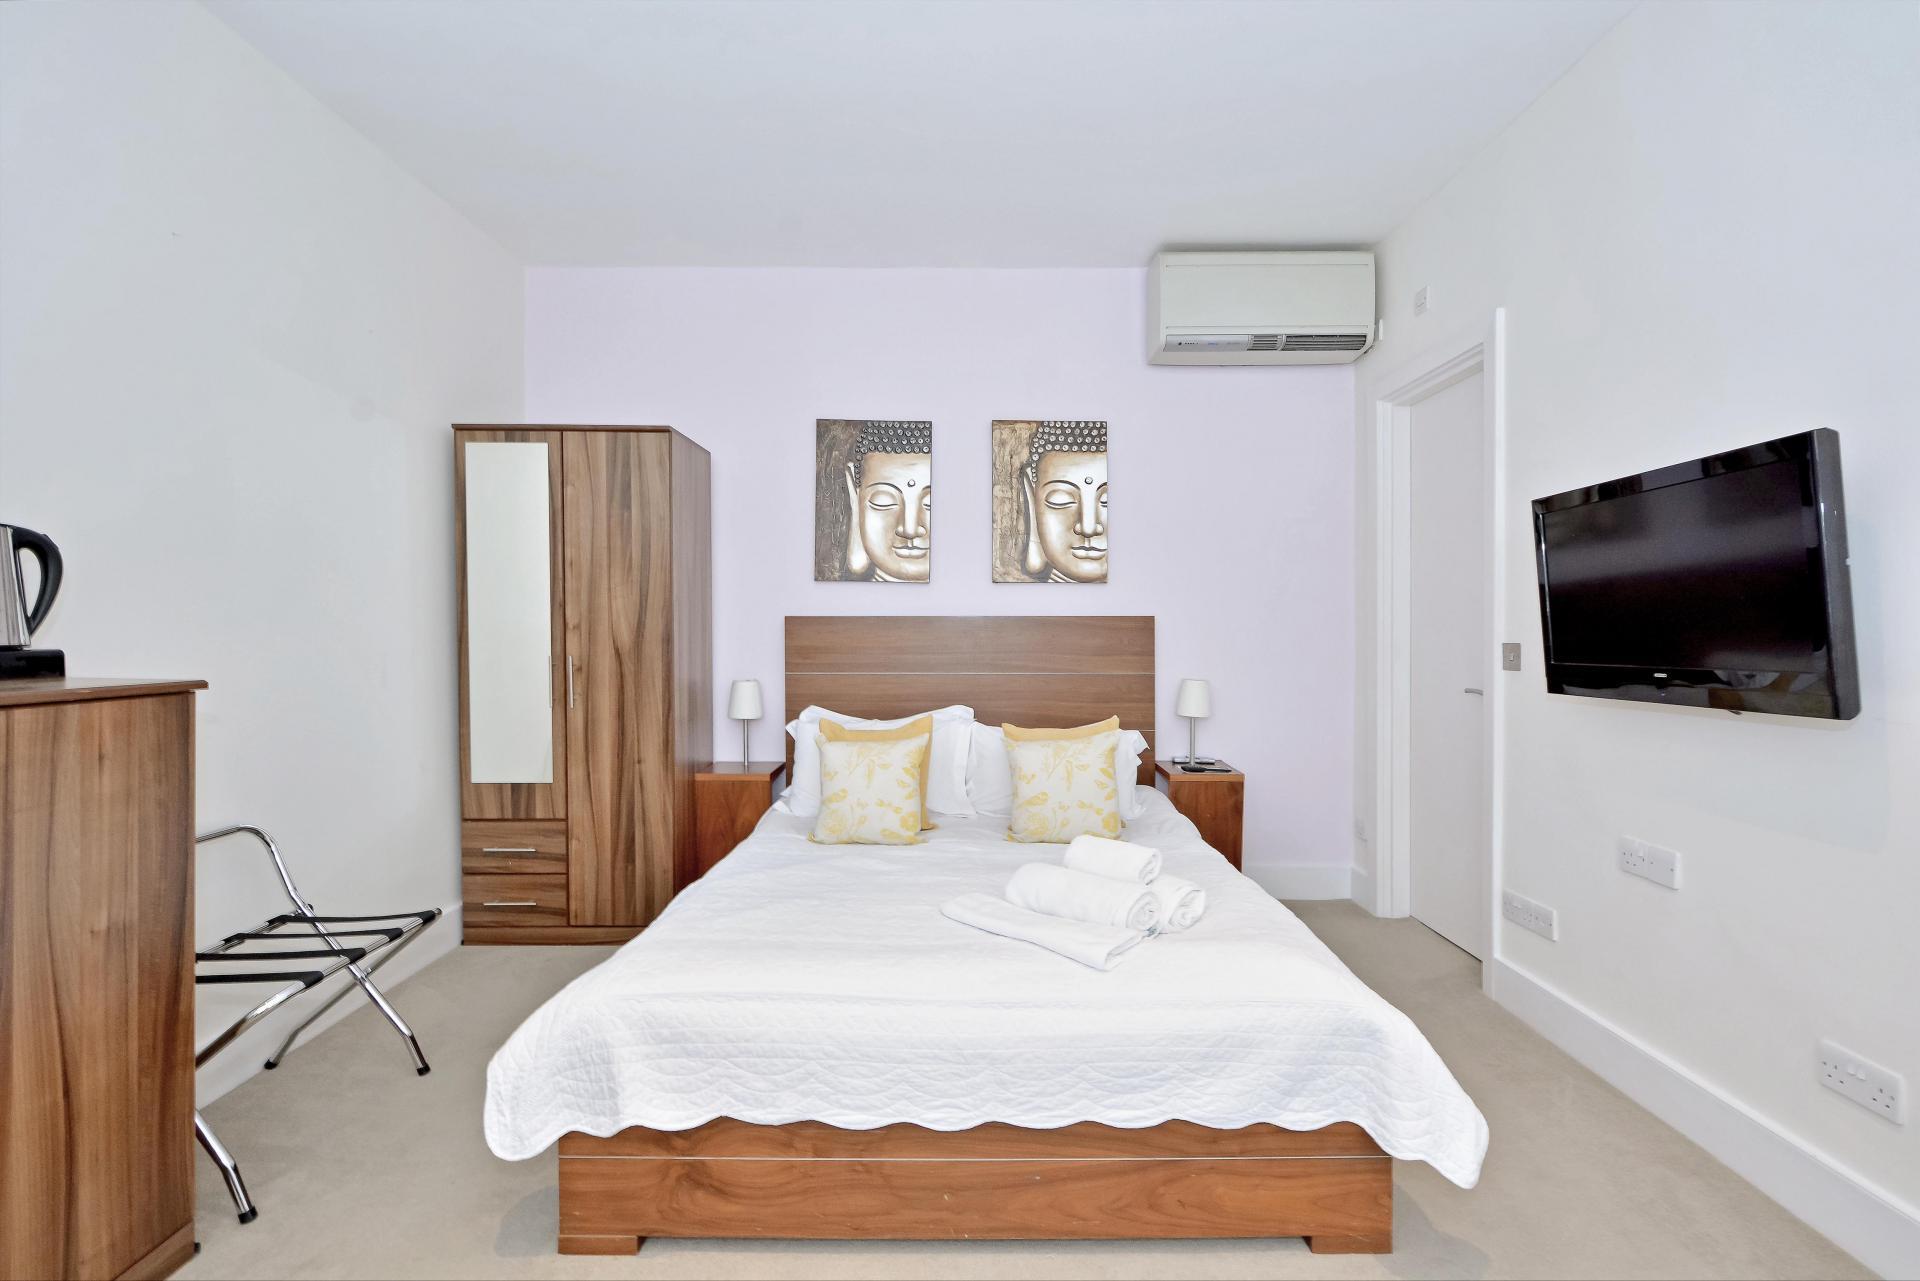 Sleep at LBS Apartments, Victoria, London